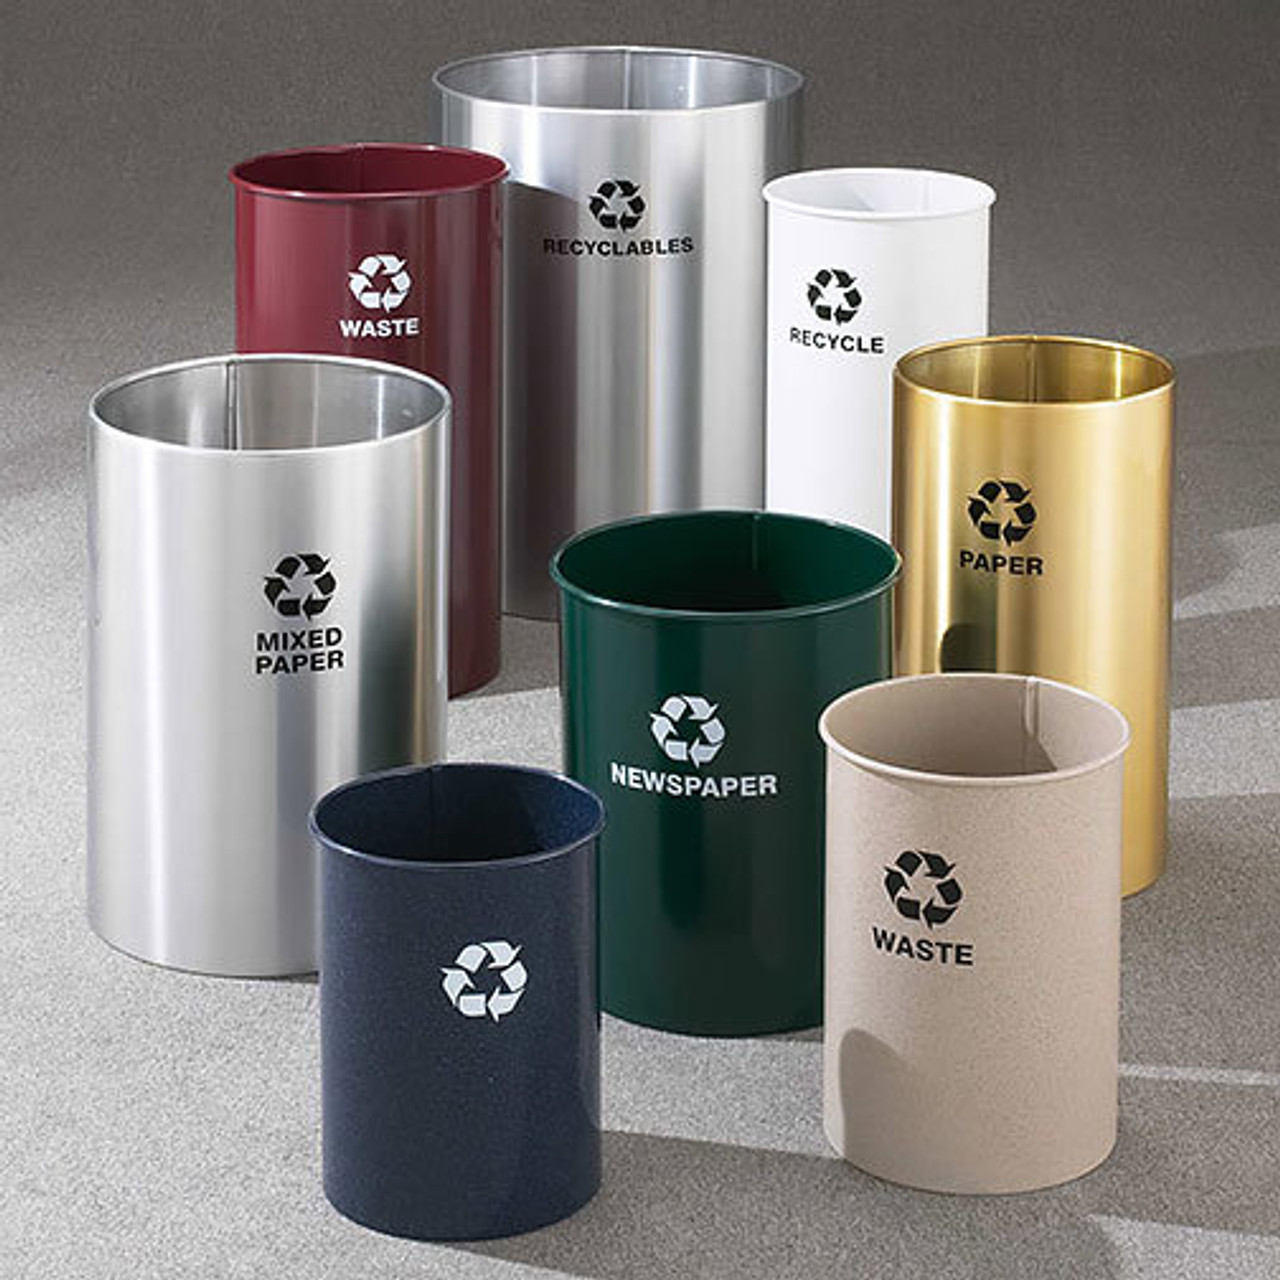 Glaro RecyclePro Open Top Recycling Bins